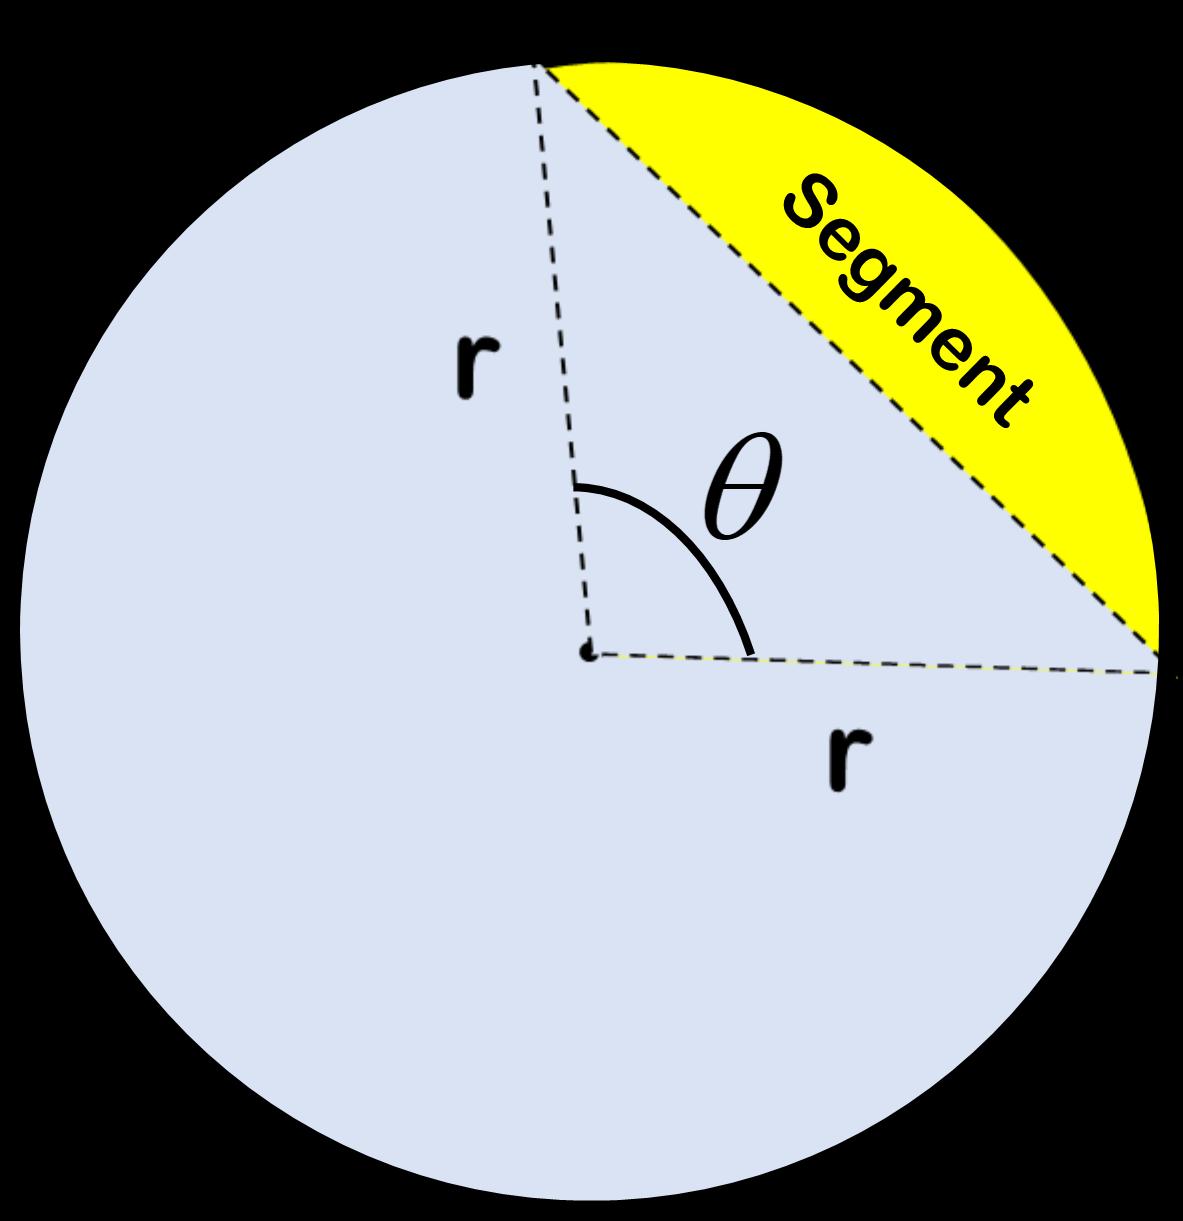 area of segment